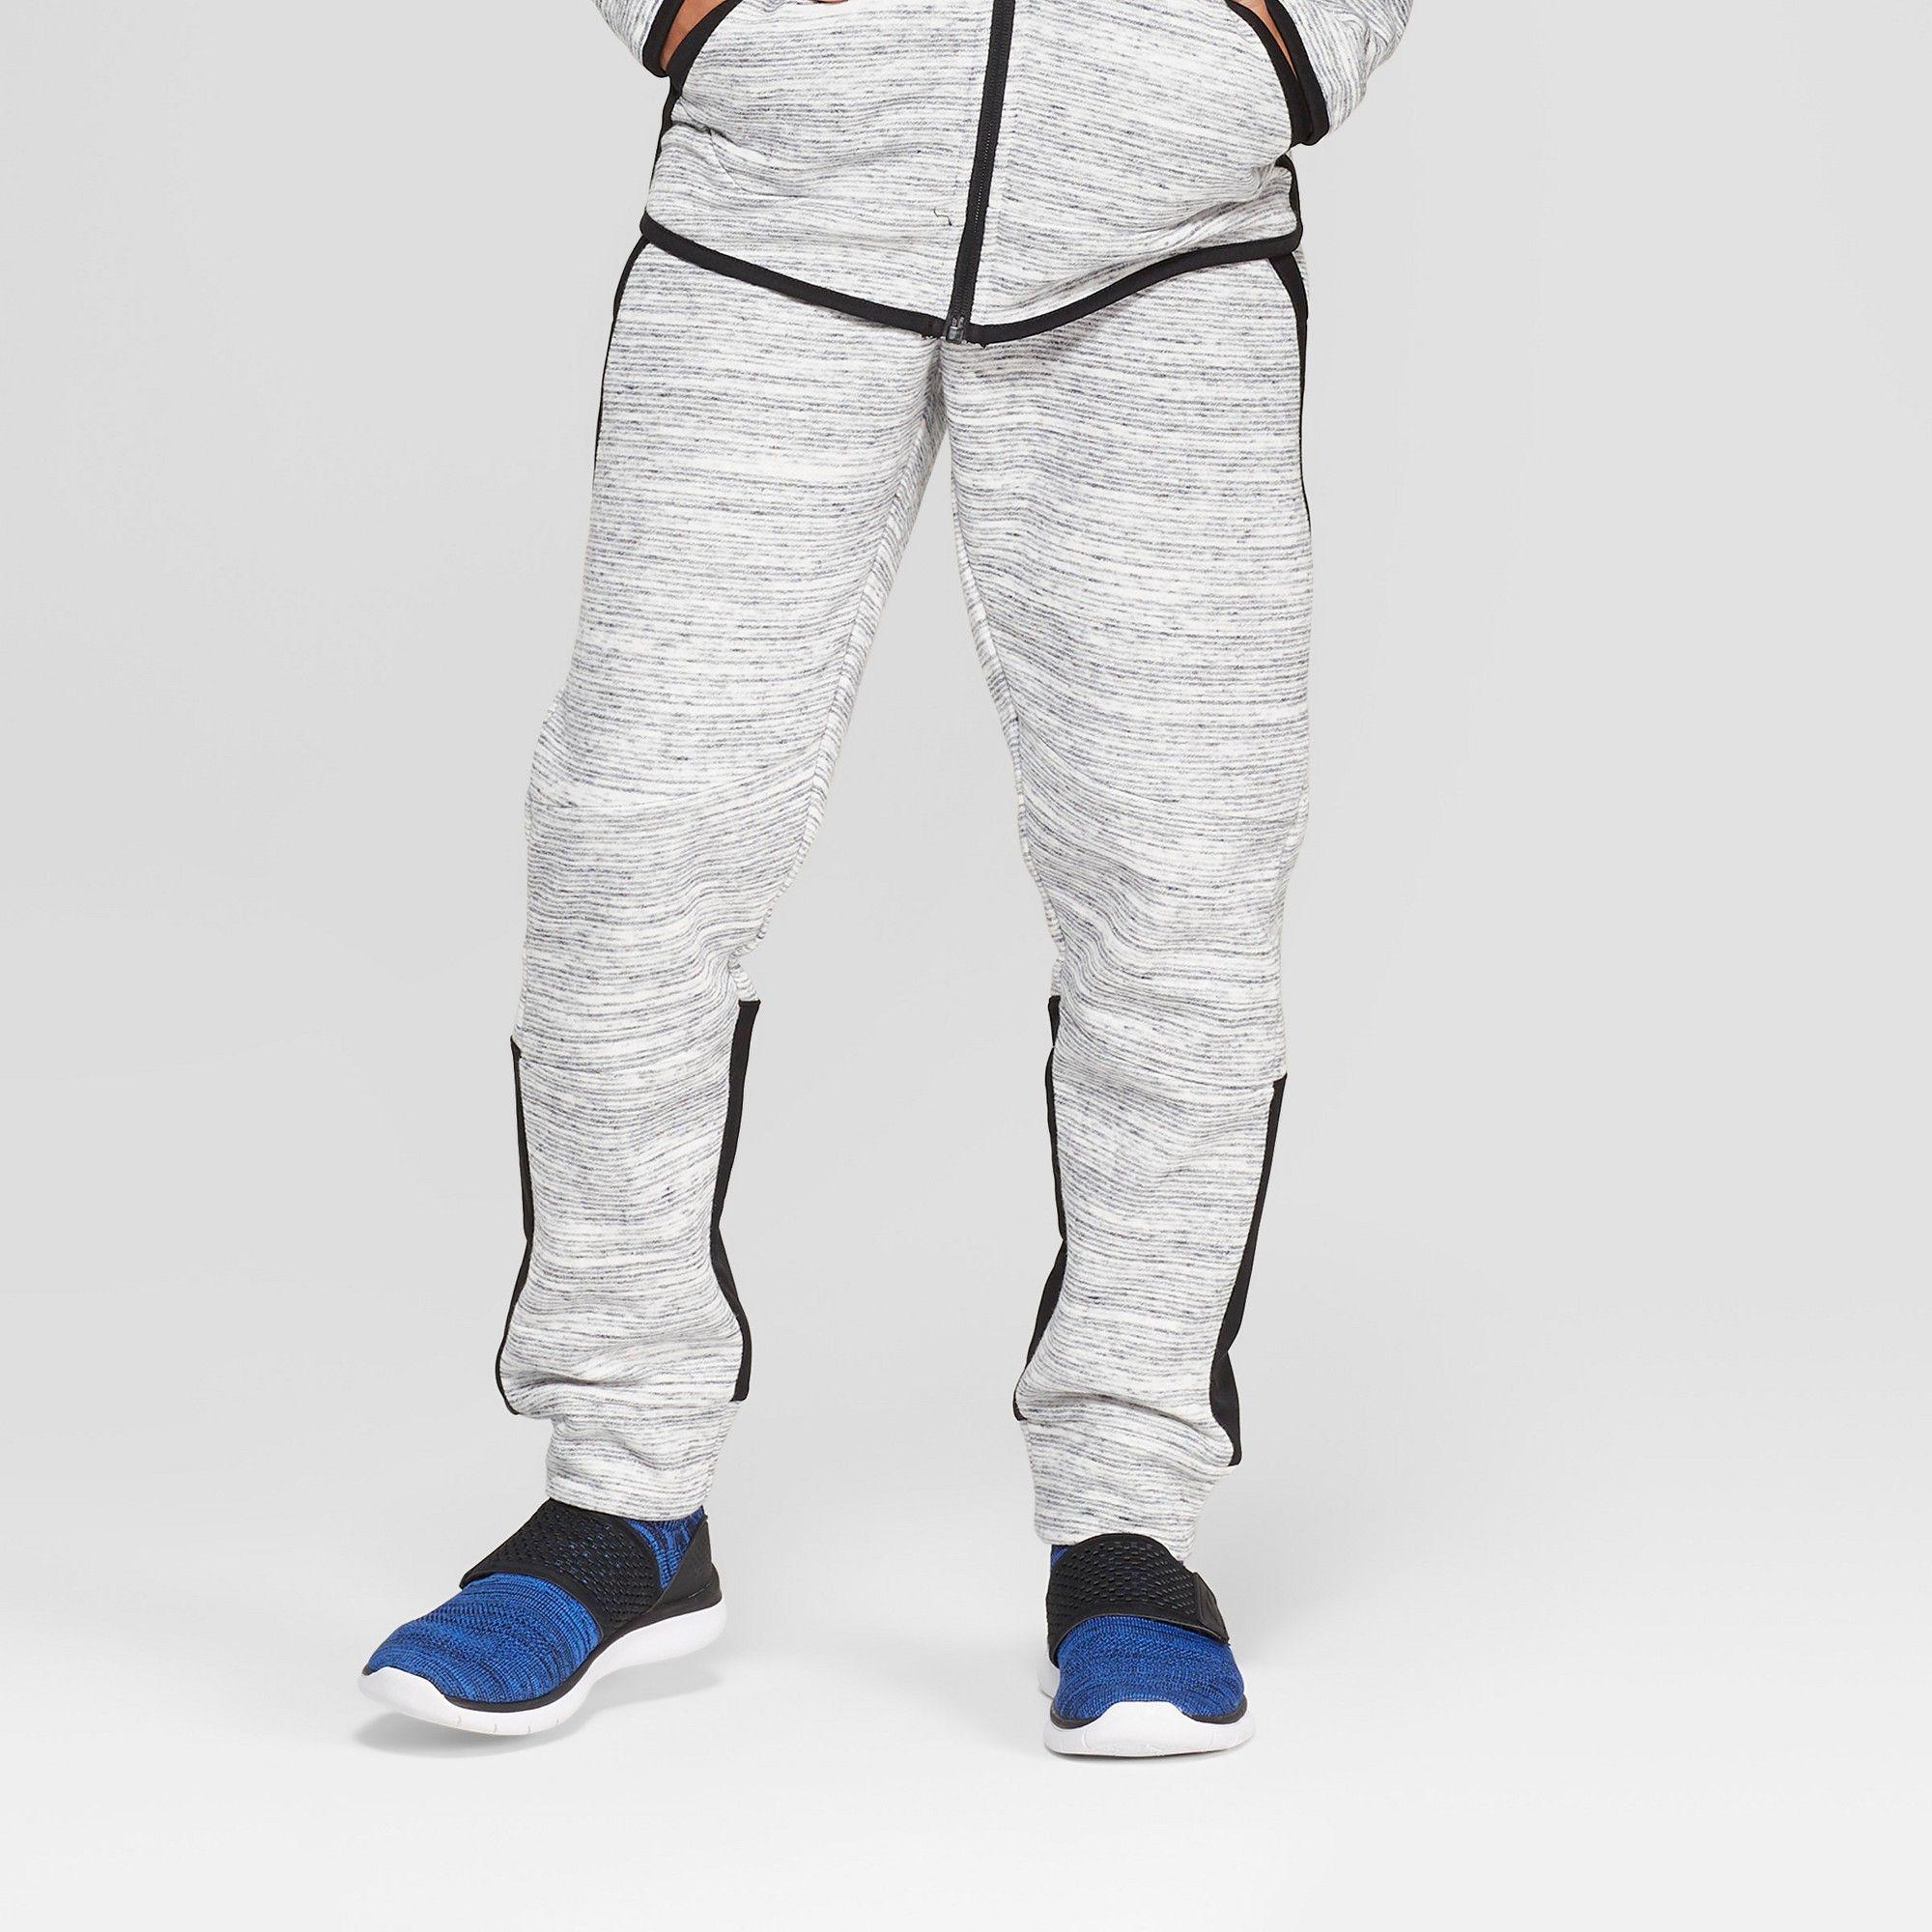 51ff099a Boys' Premium Woven Pieced Fleece Jogger Pants - C9 Champion Light Gray  Heather XL, Heather Grey